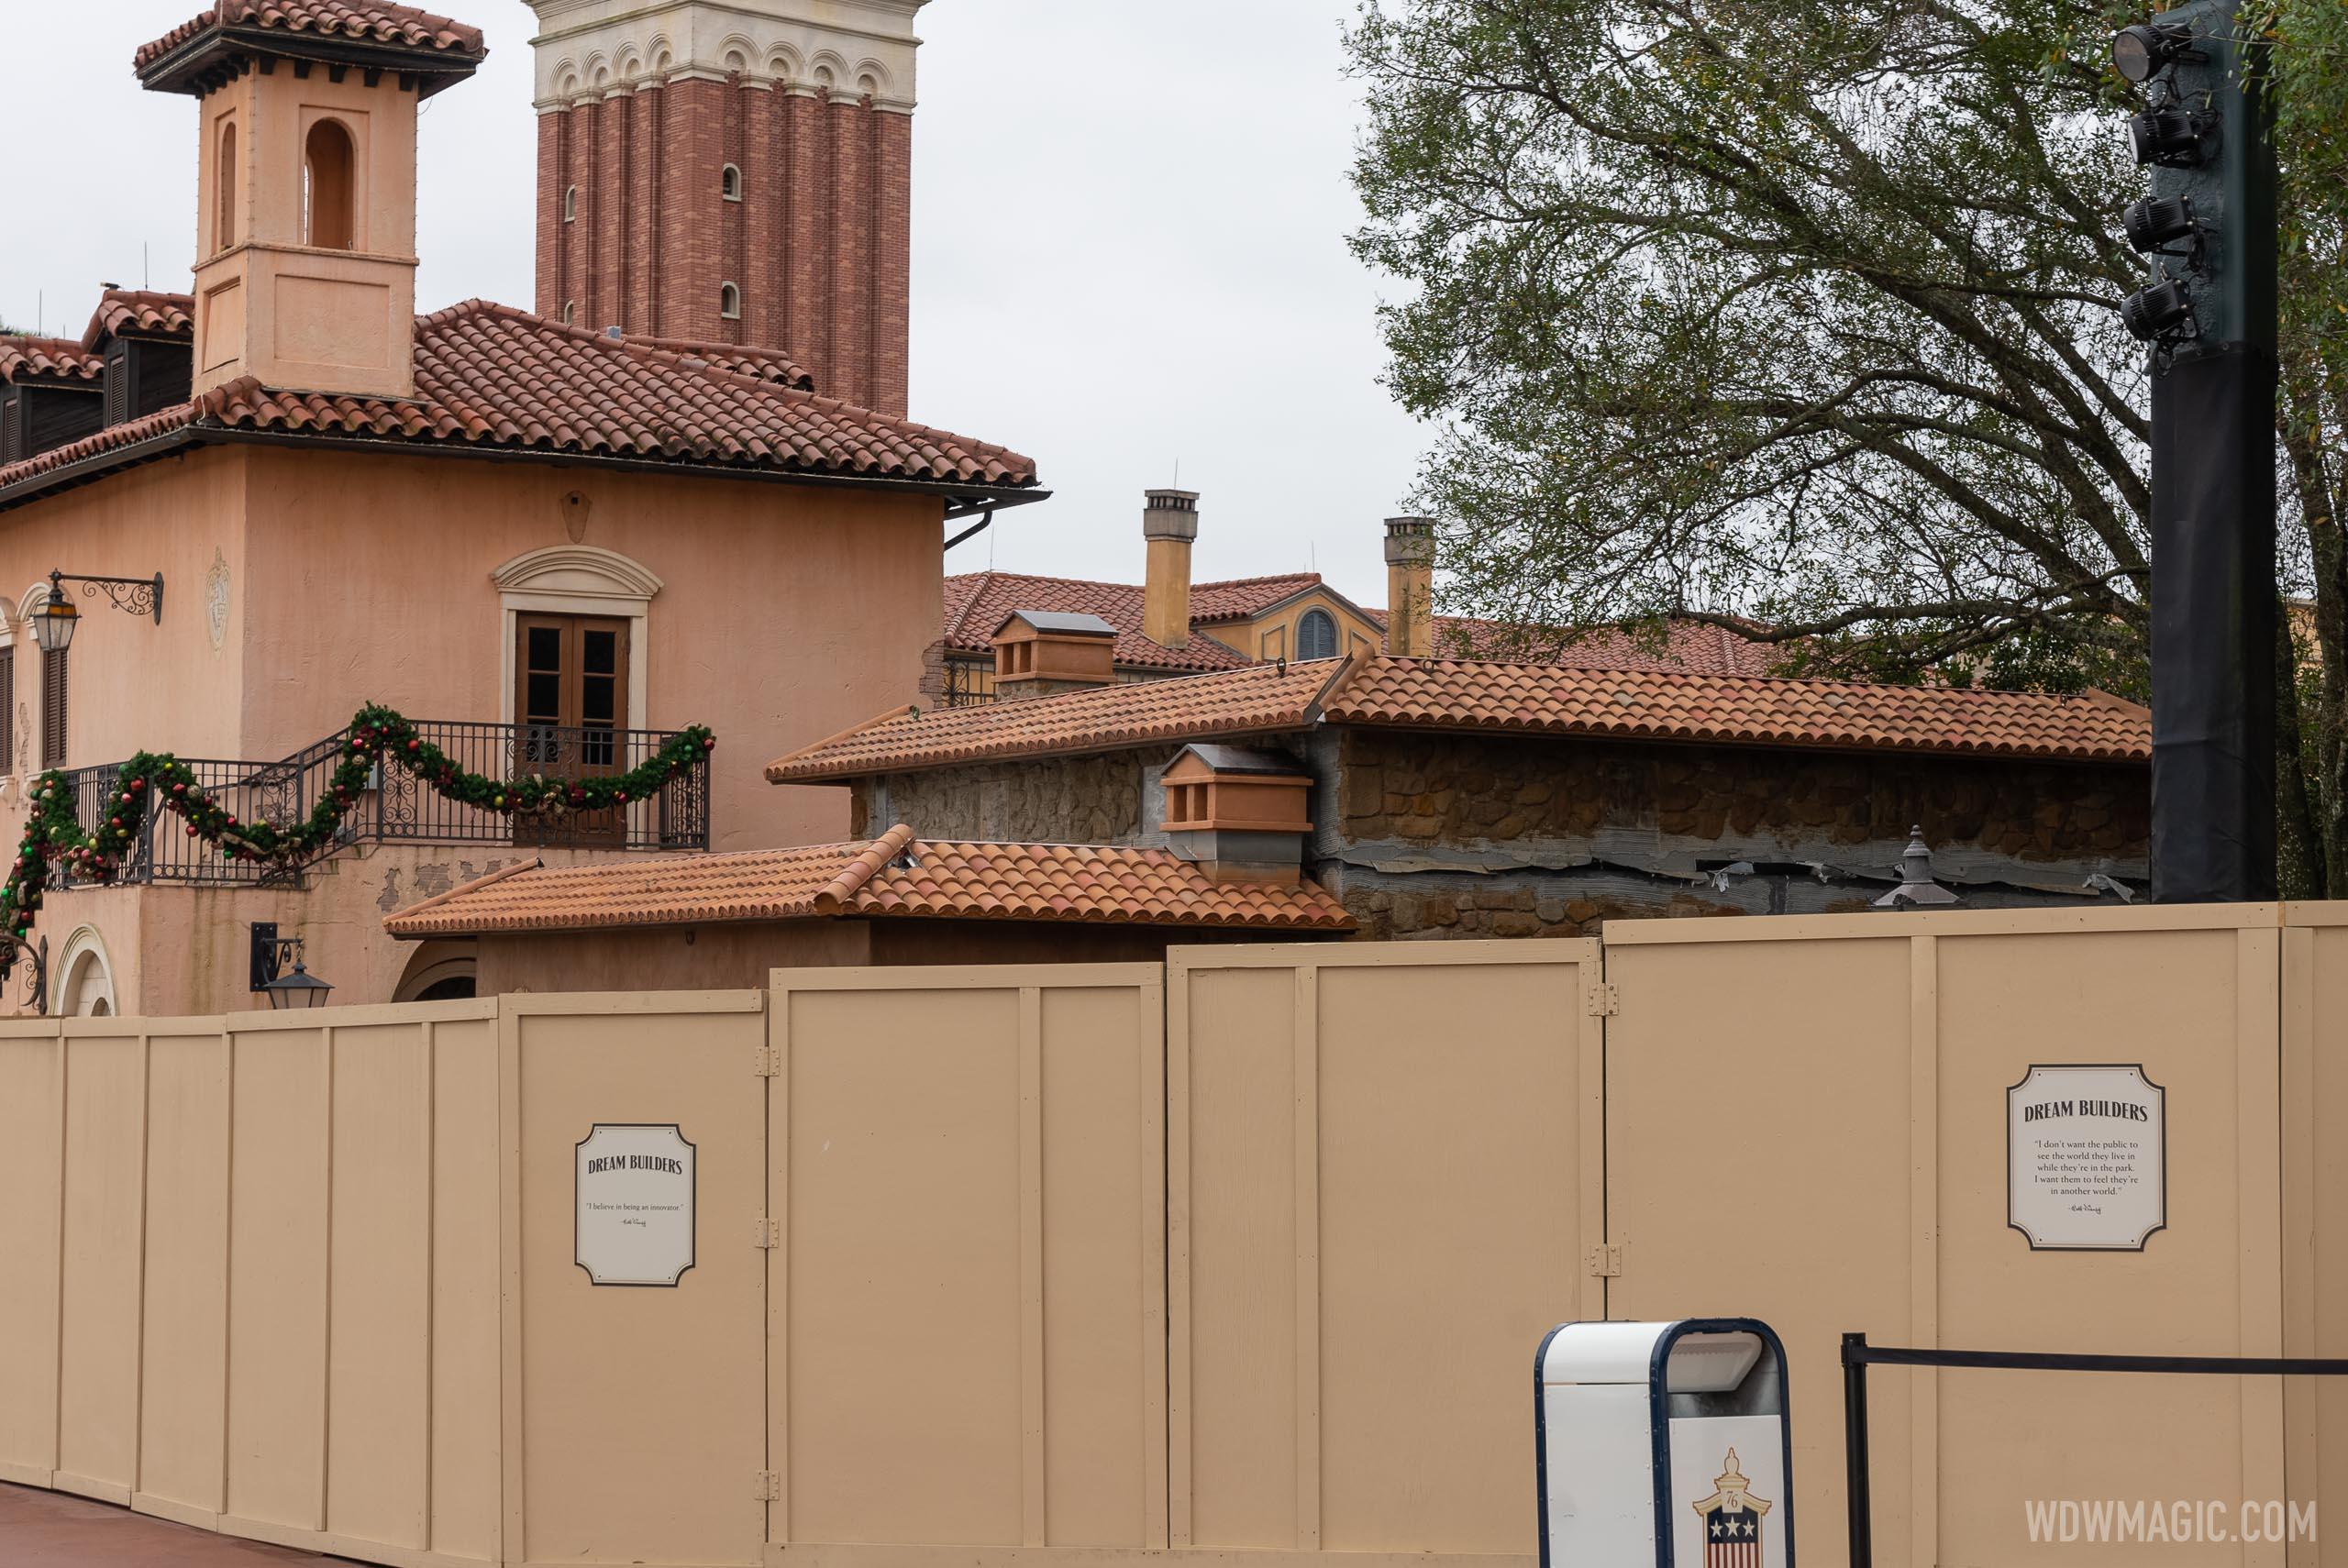 La Gelateria construction - January 12 2021